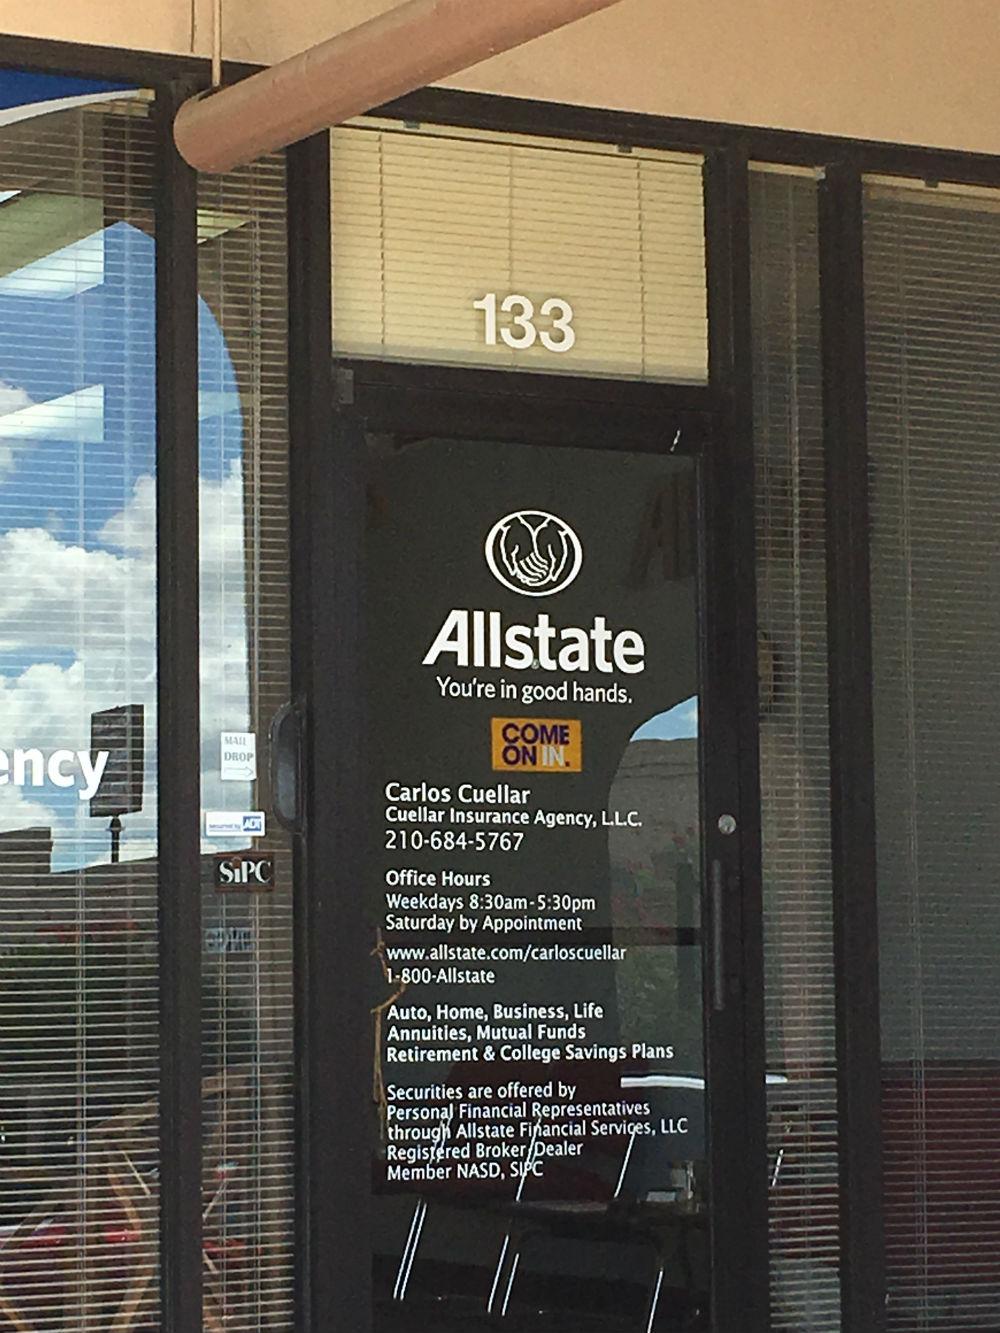 Allstate   Car Insurance in San Antonio, TX - Carlos Cuellar